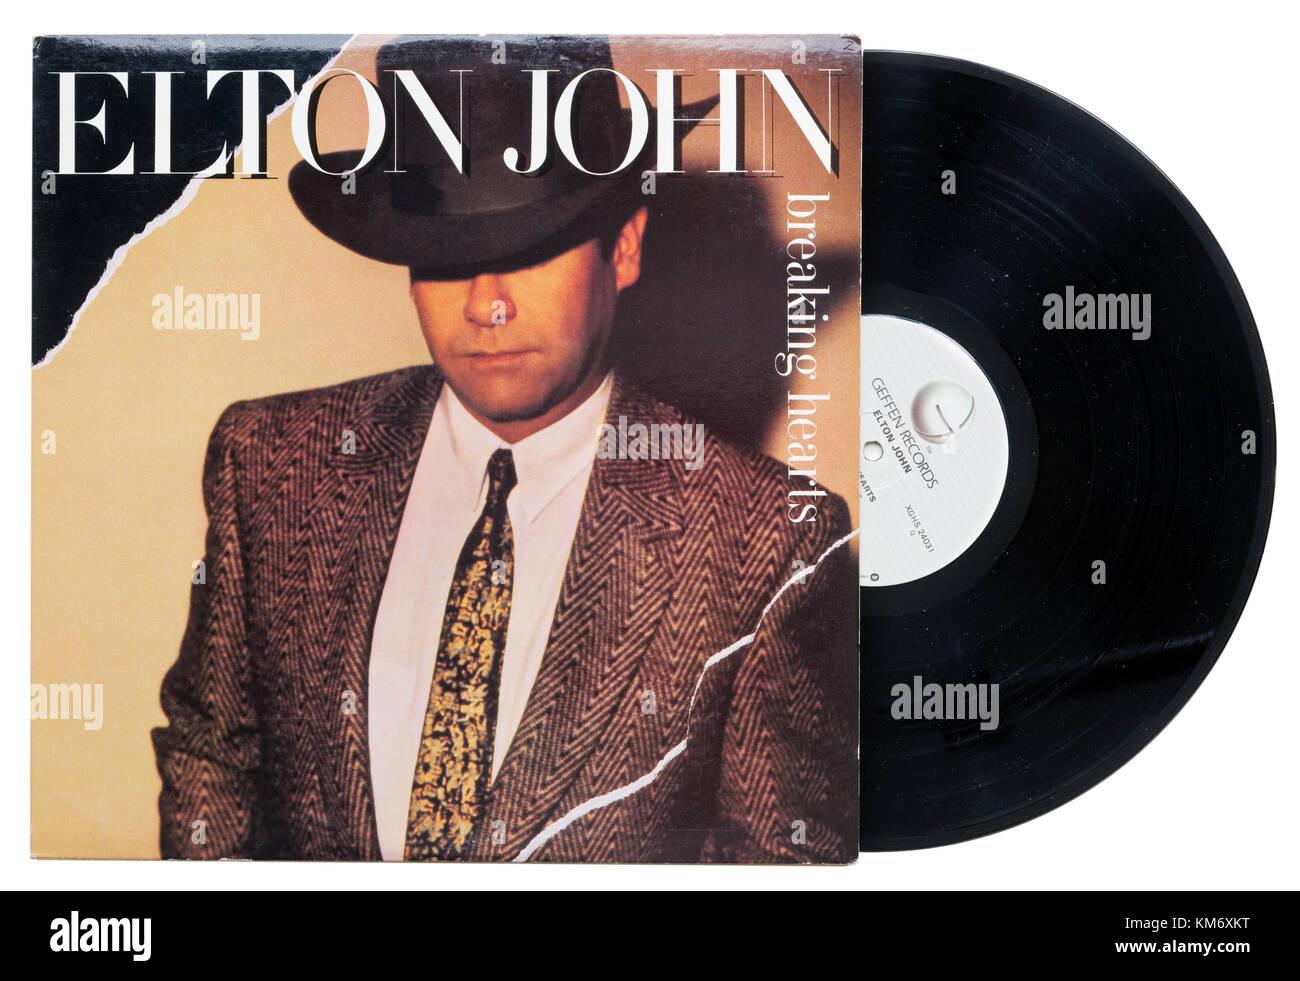 Elton  John Breaking Hearts album - Stock Image